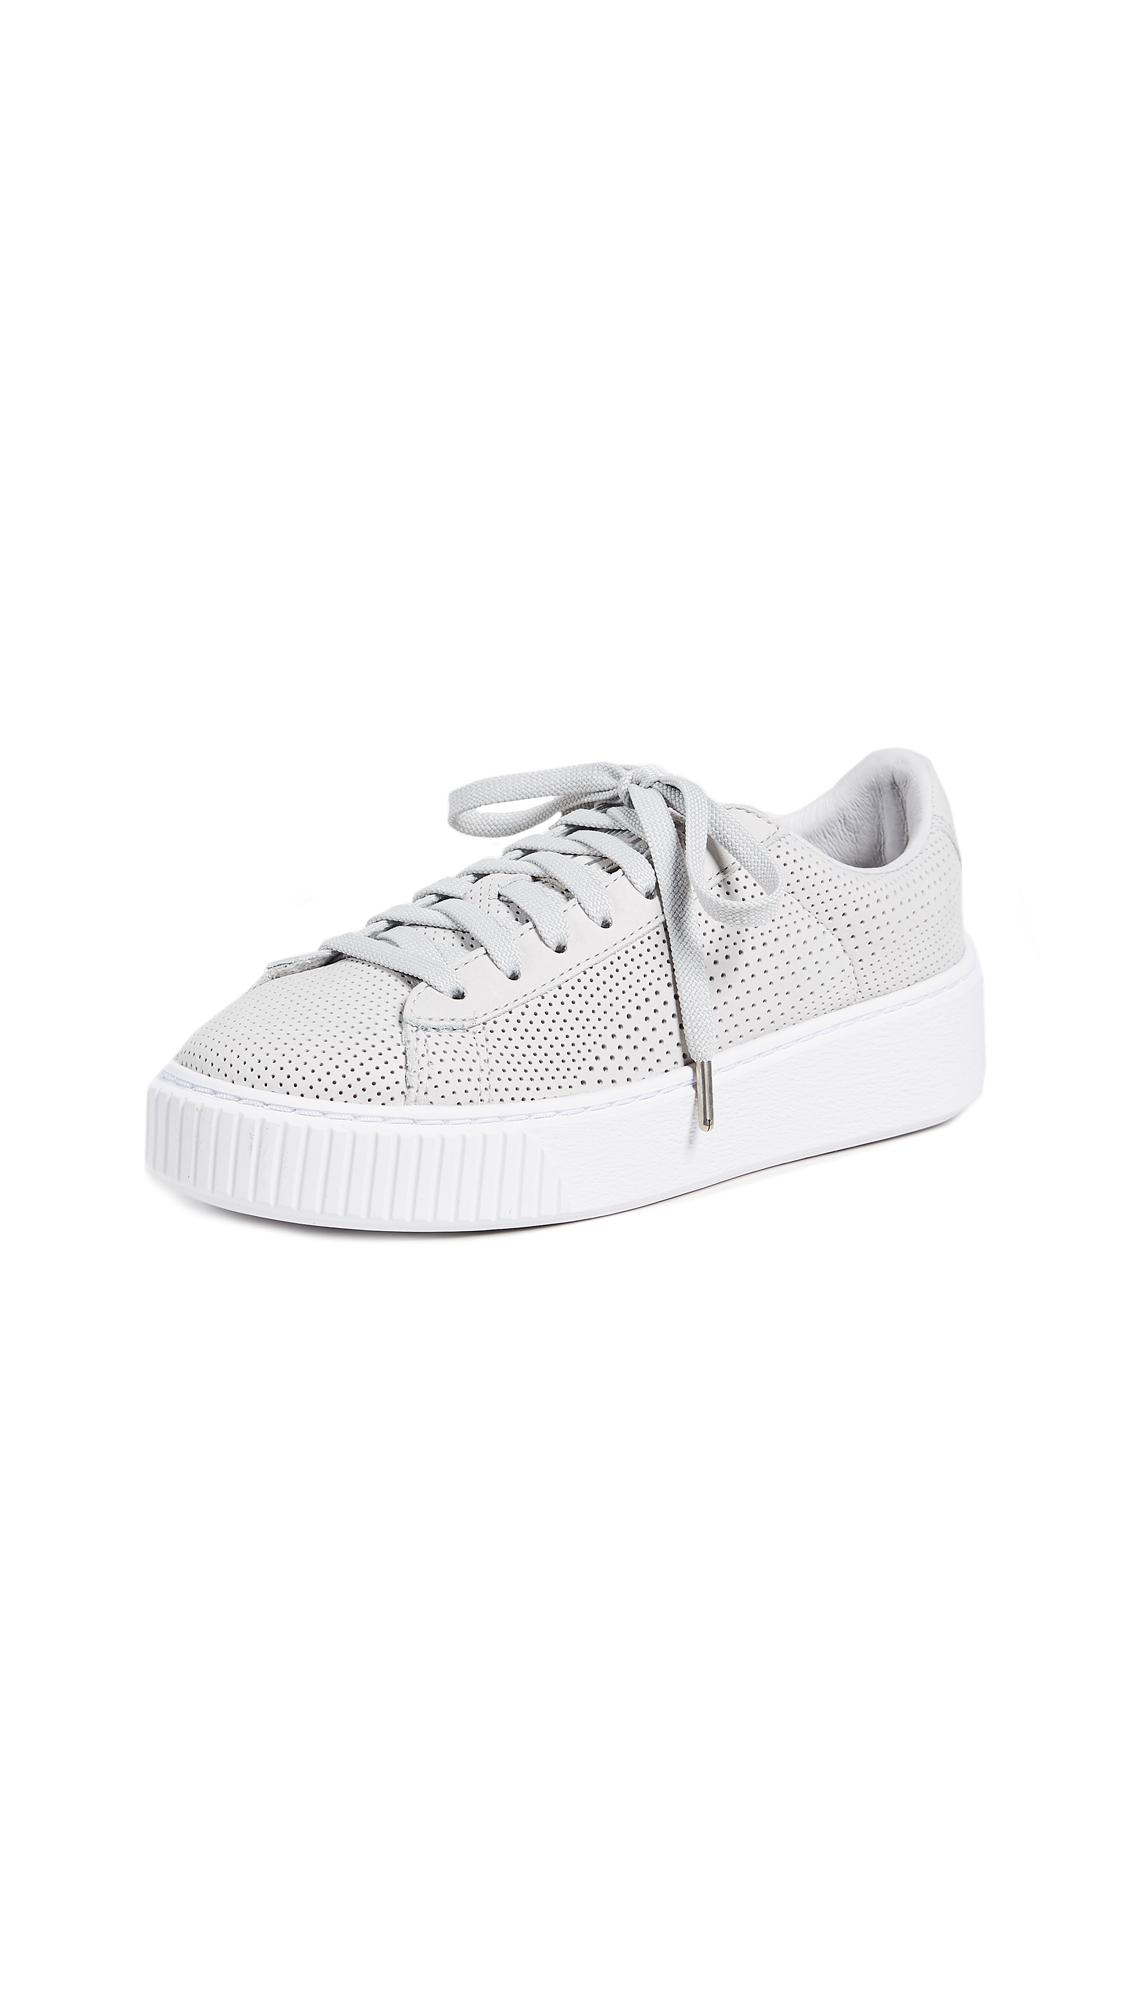 PUMA Basket Platform Perforated Sneakers